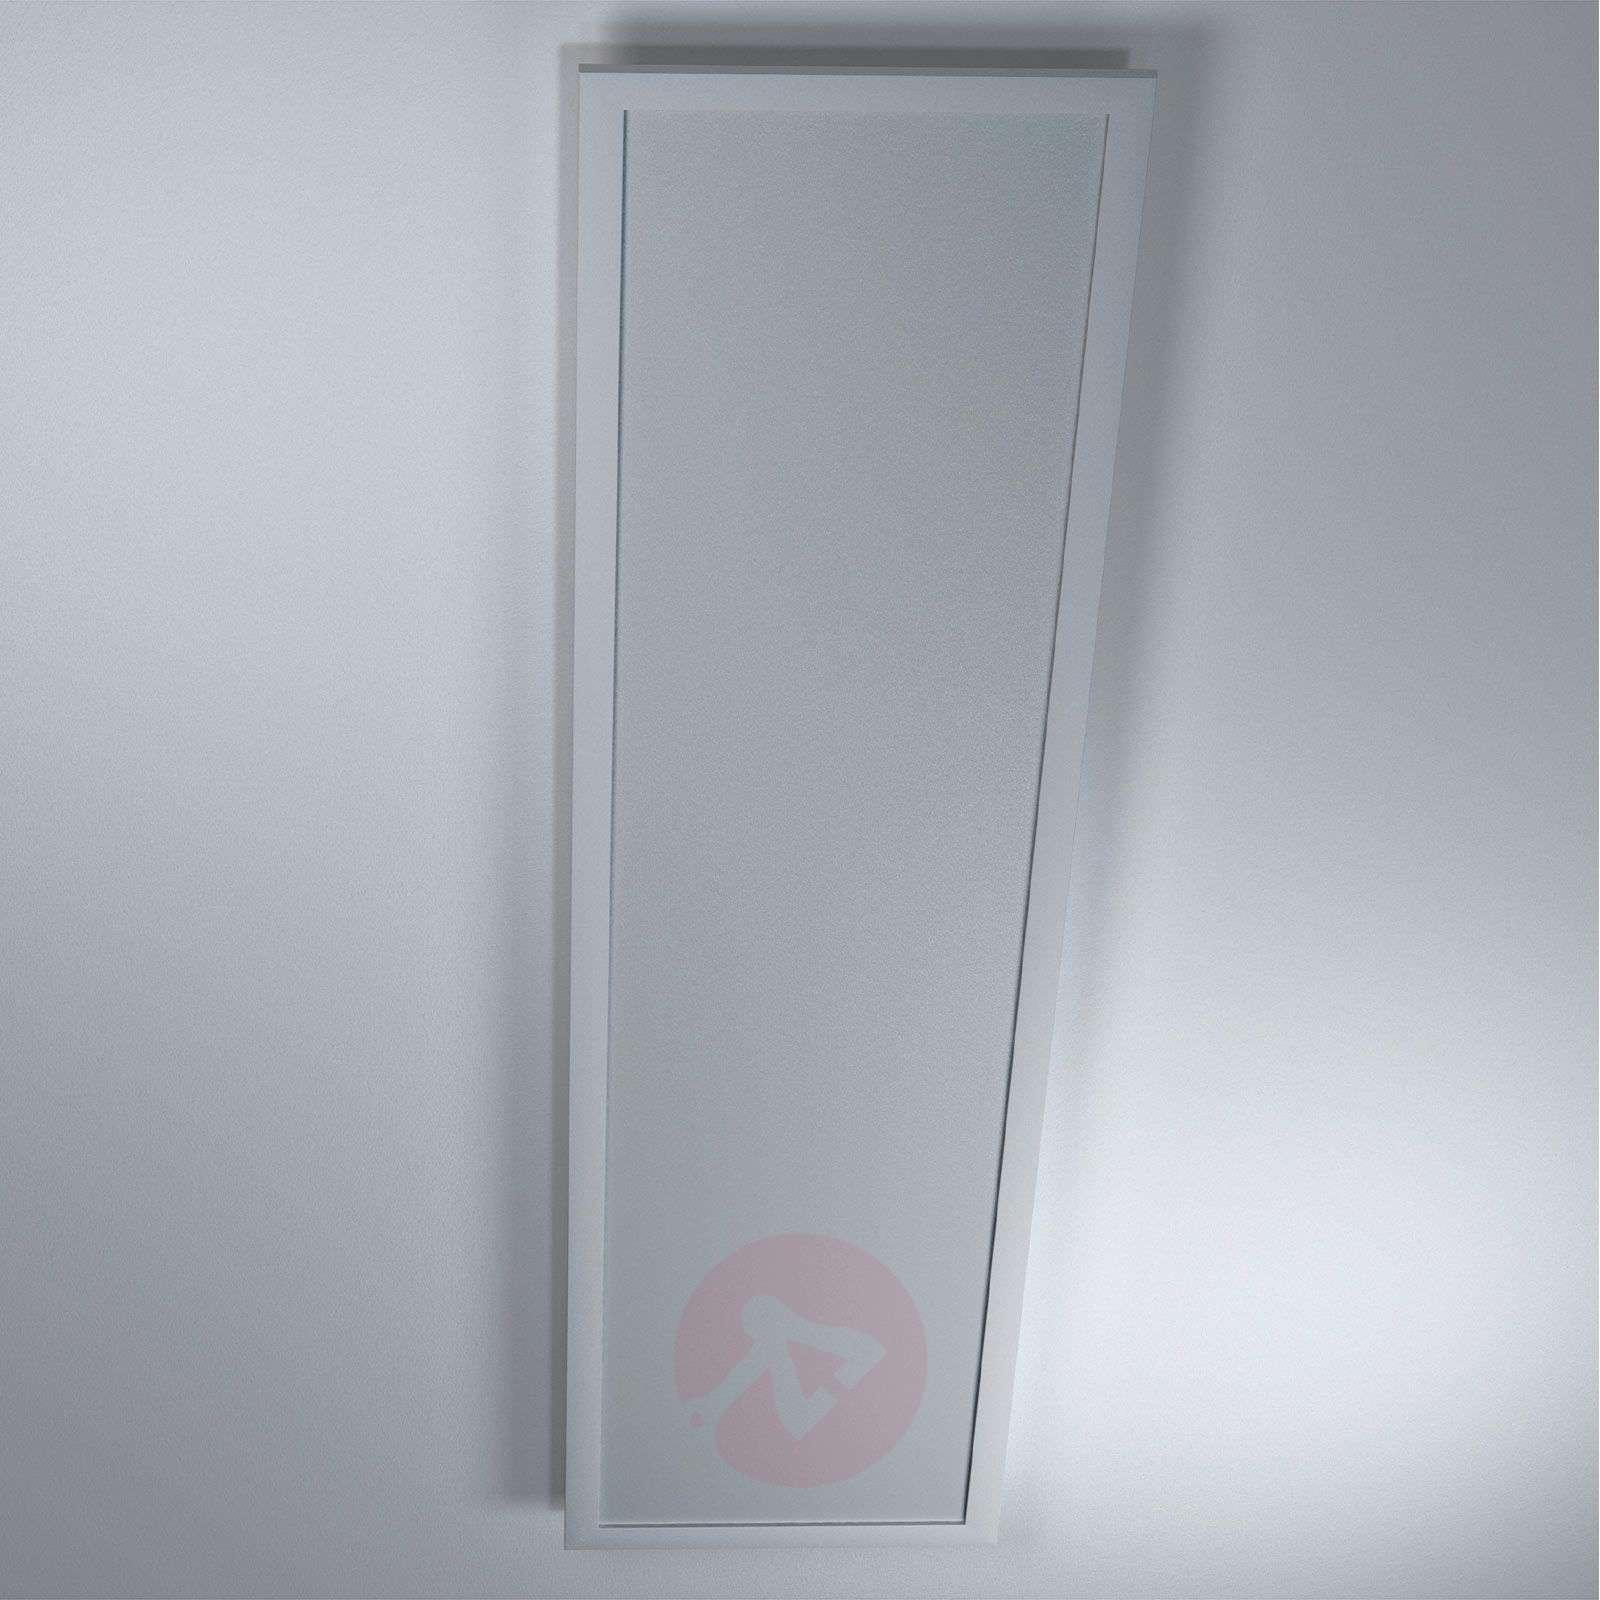 LEDVANCE Planon Plus LED panel 120 x 30 cm 840 36W-6106025-01